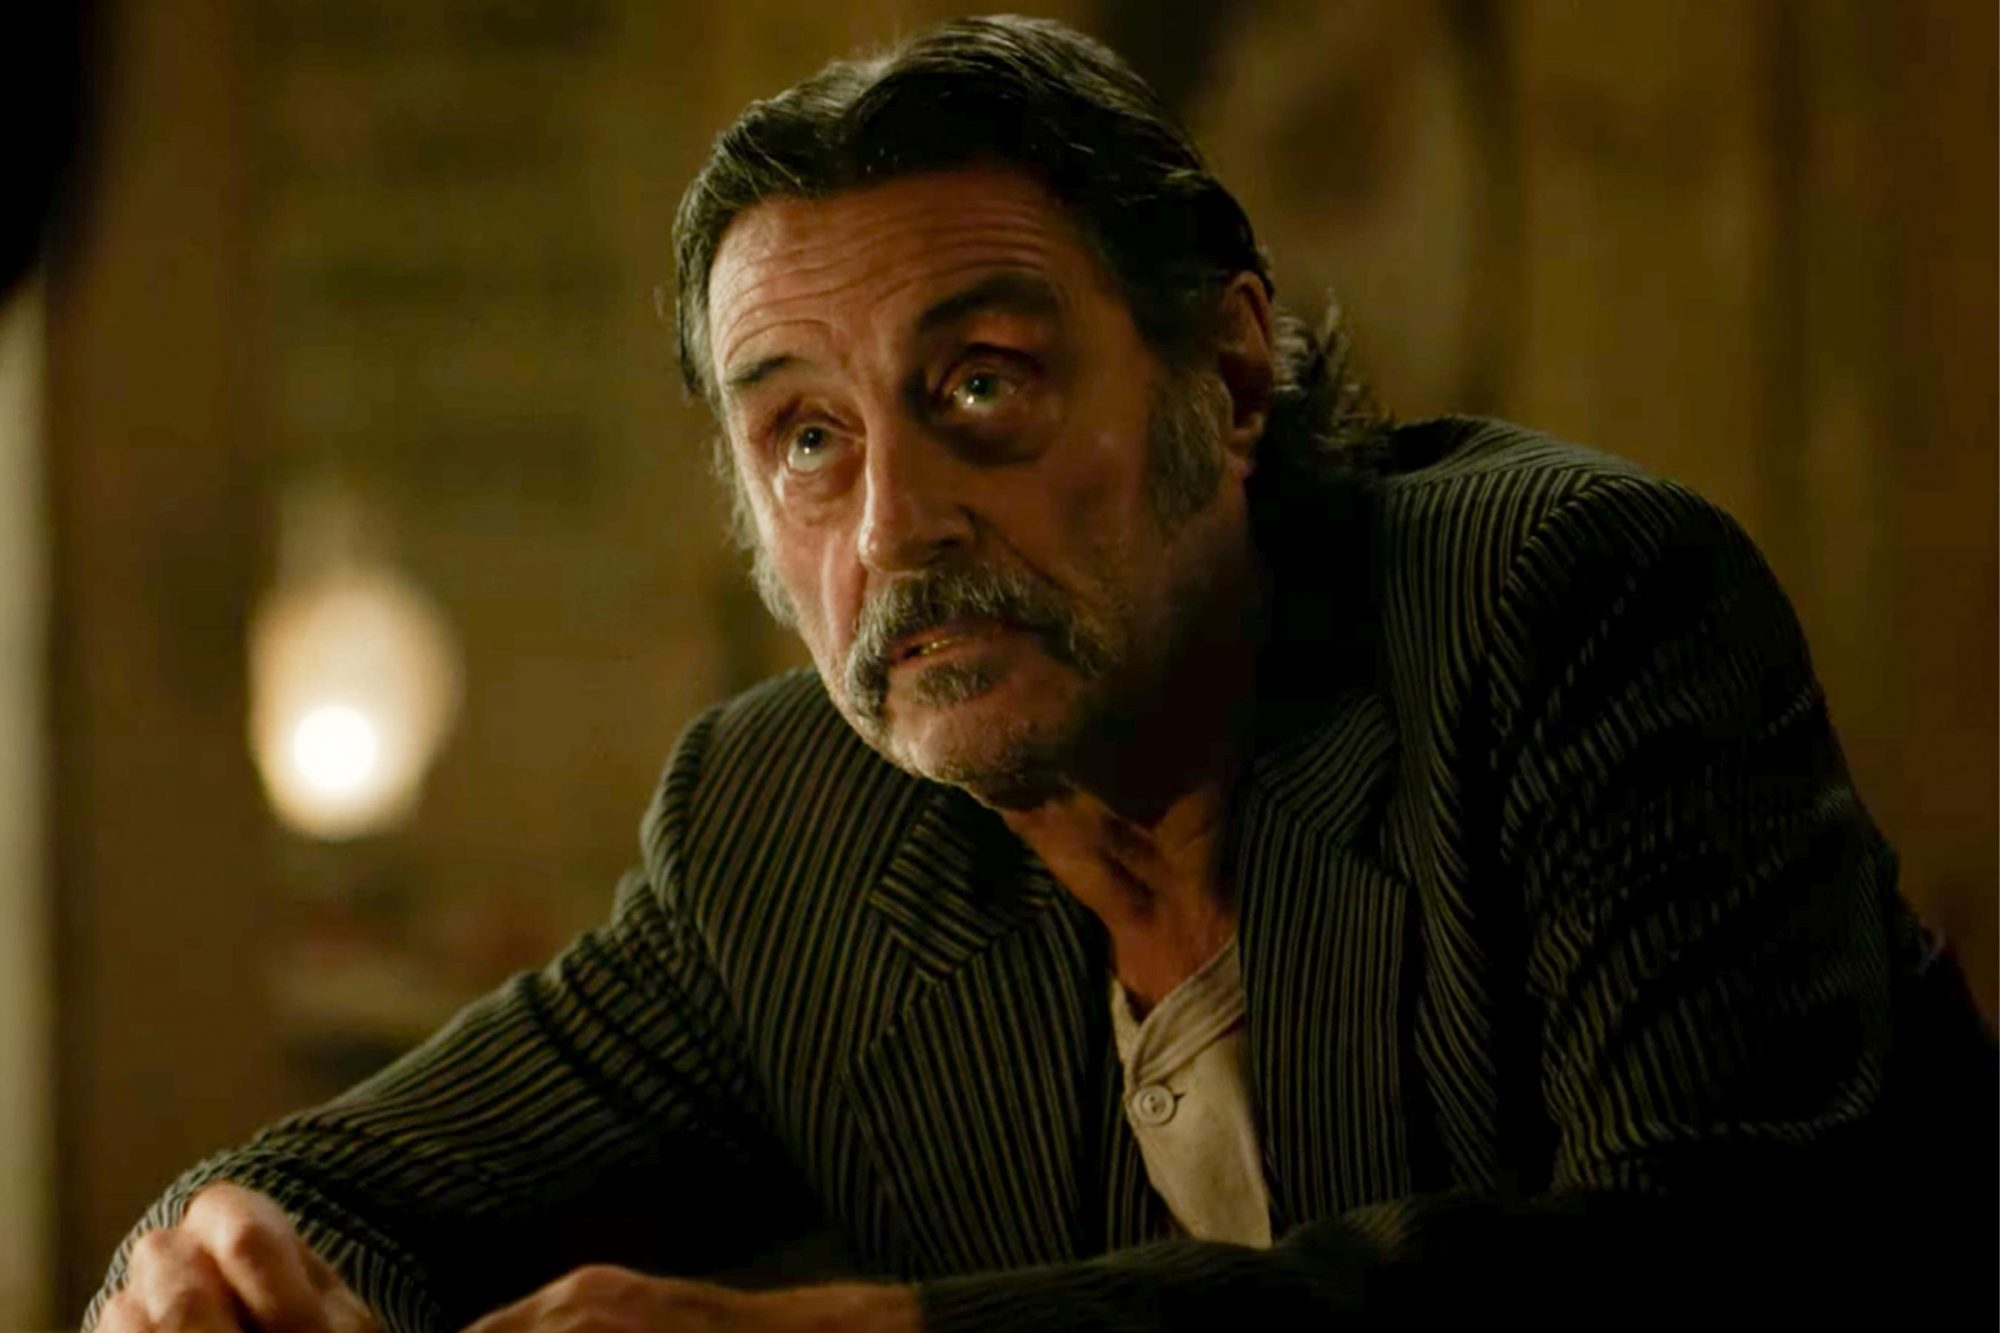 Deadwood: The Movie (2019) | Official Trailer | HBO (screen grab) Ian McShane https://www.youtube.com/watch?v=s0WrXmhvXTA CR: HBO